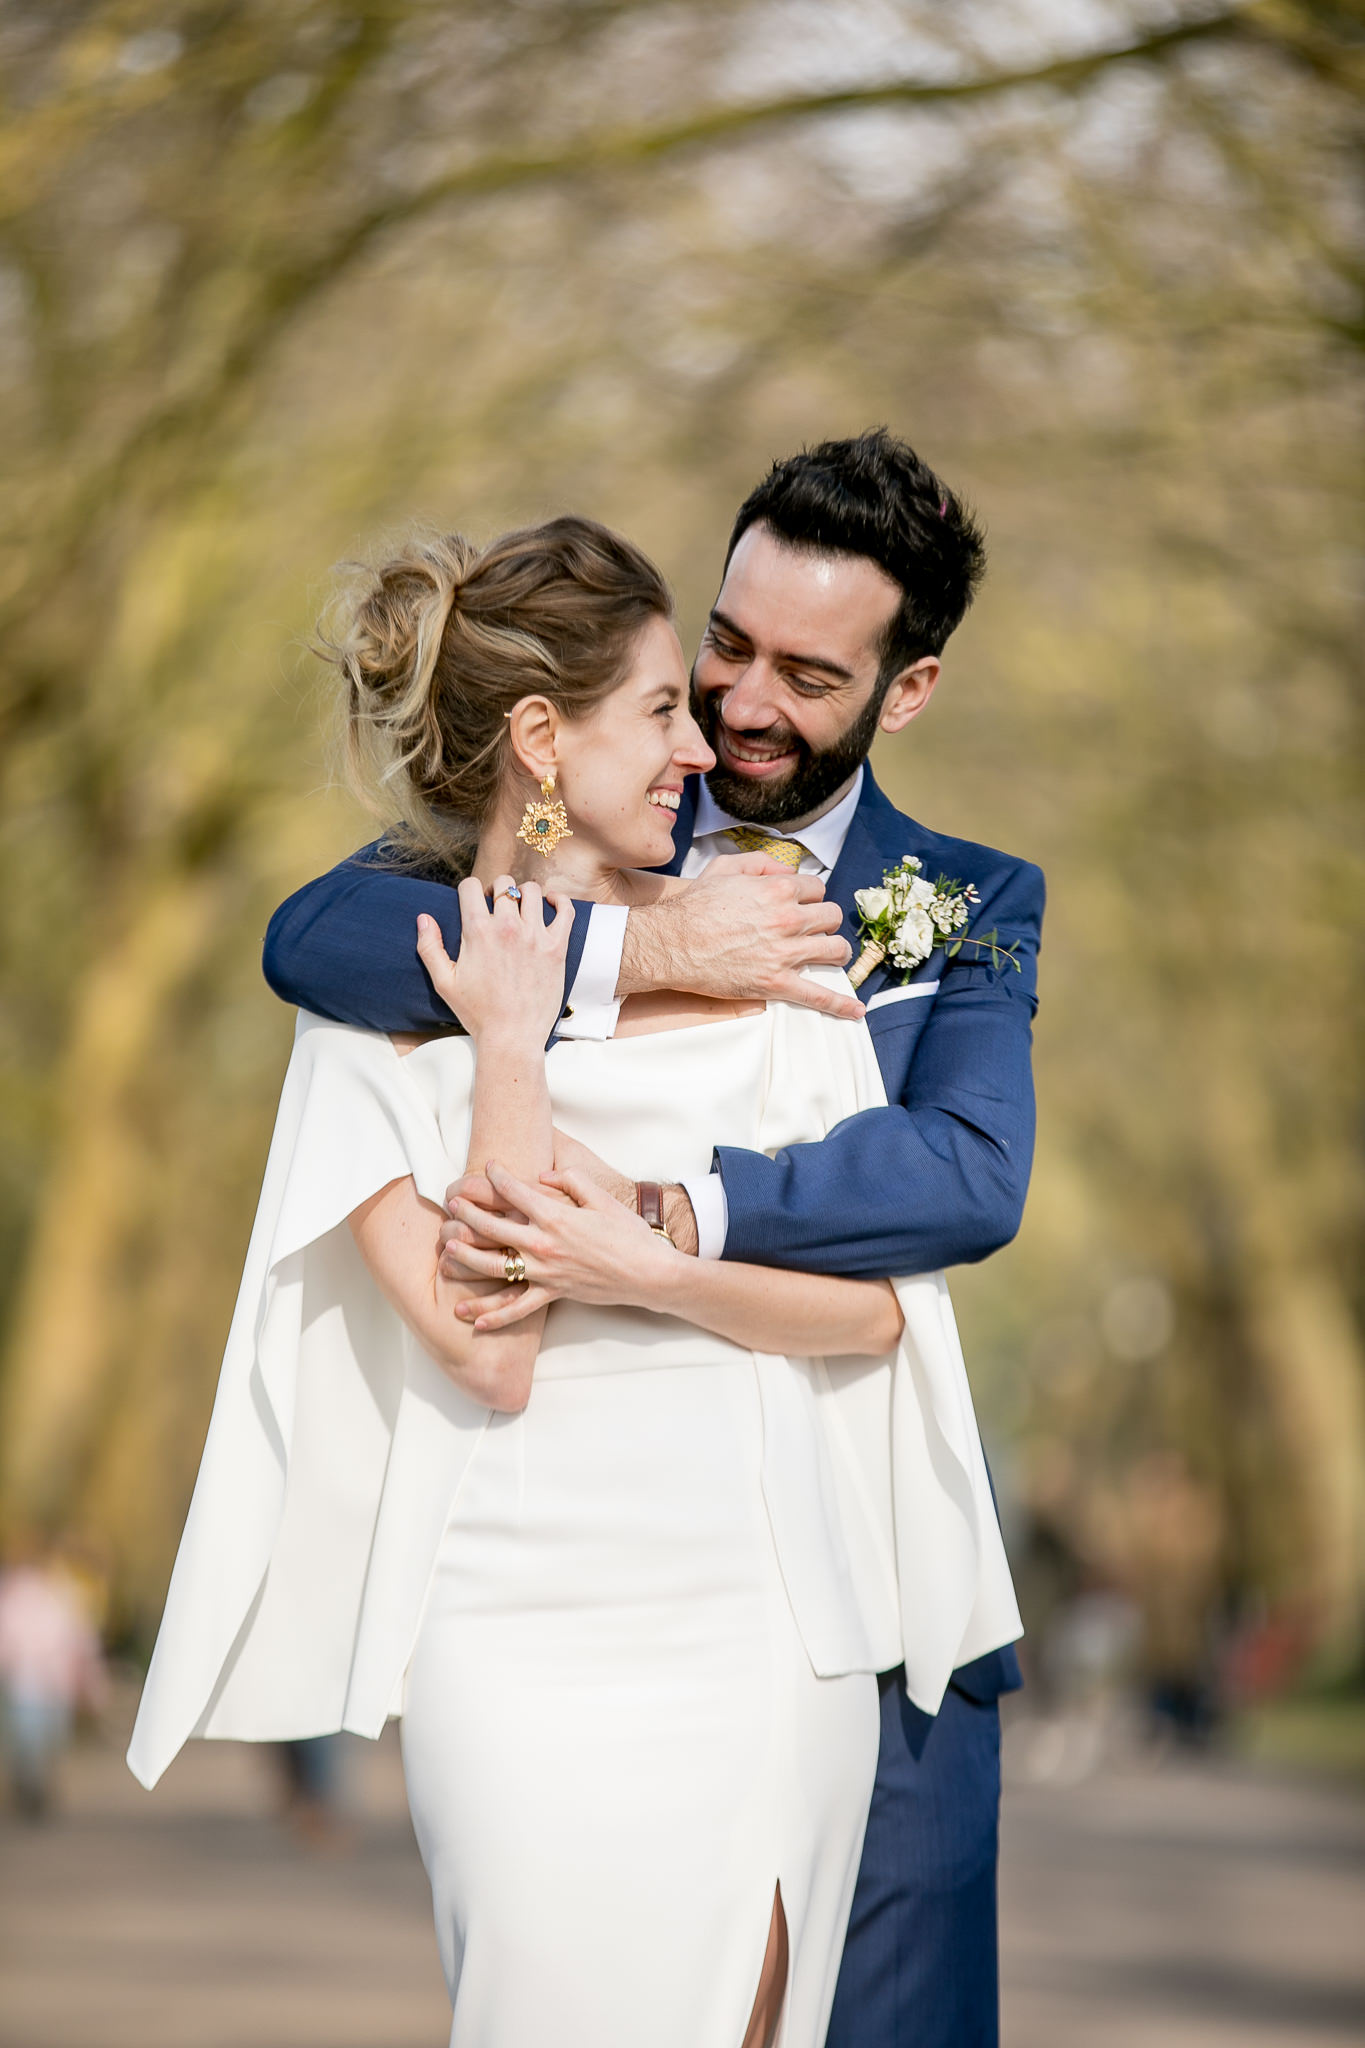 ILEANA & DRAZ WEDDING WEB -1007.jpg